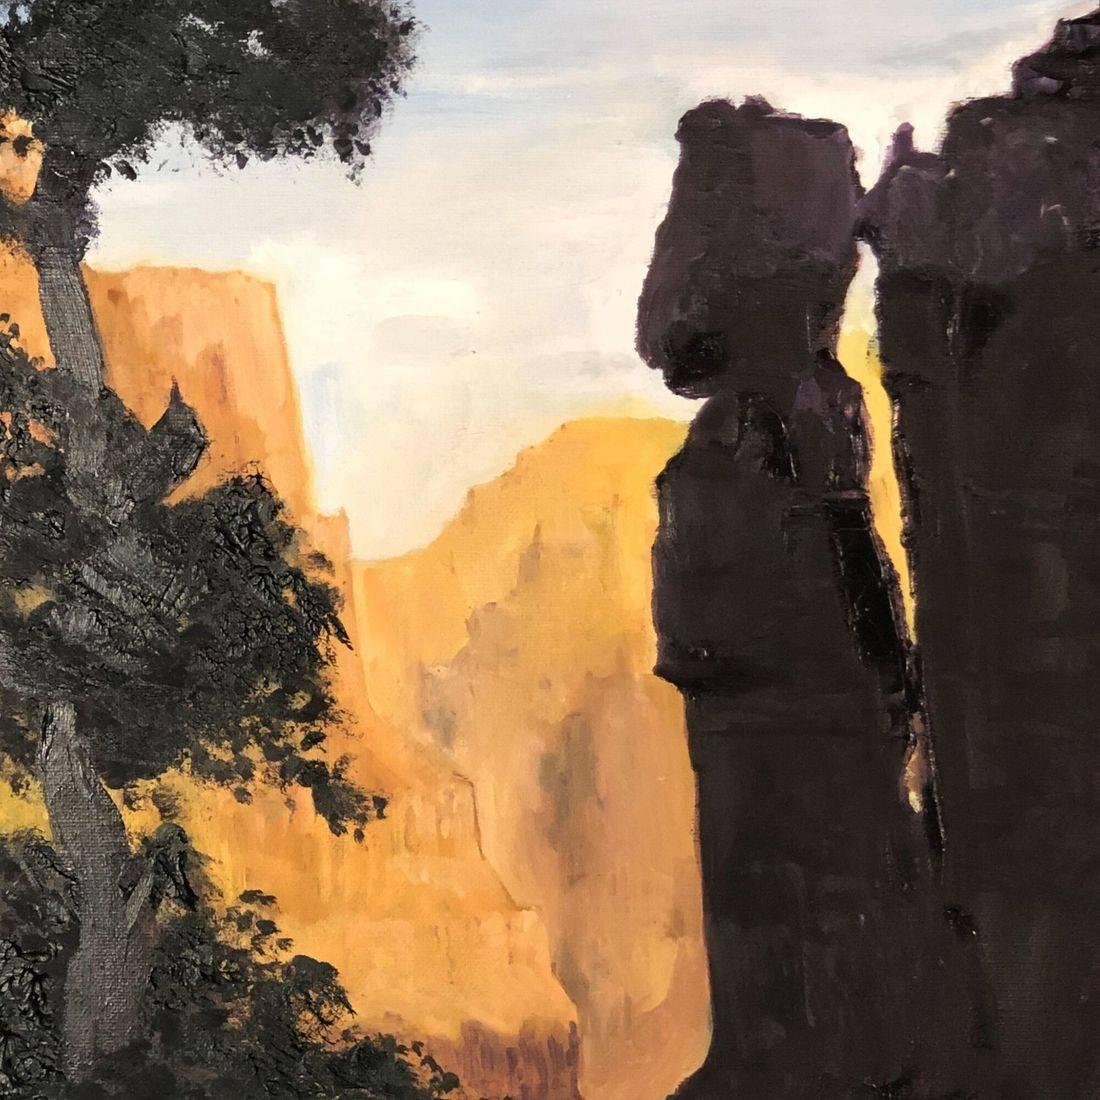 "12x24"" oil on canvas, Green River, Utah, Rafting, camping, Nefertiti, canyon, art, painting, river life, boating, boat'n, Sandy Bray White"